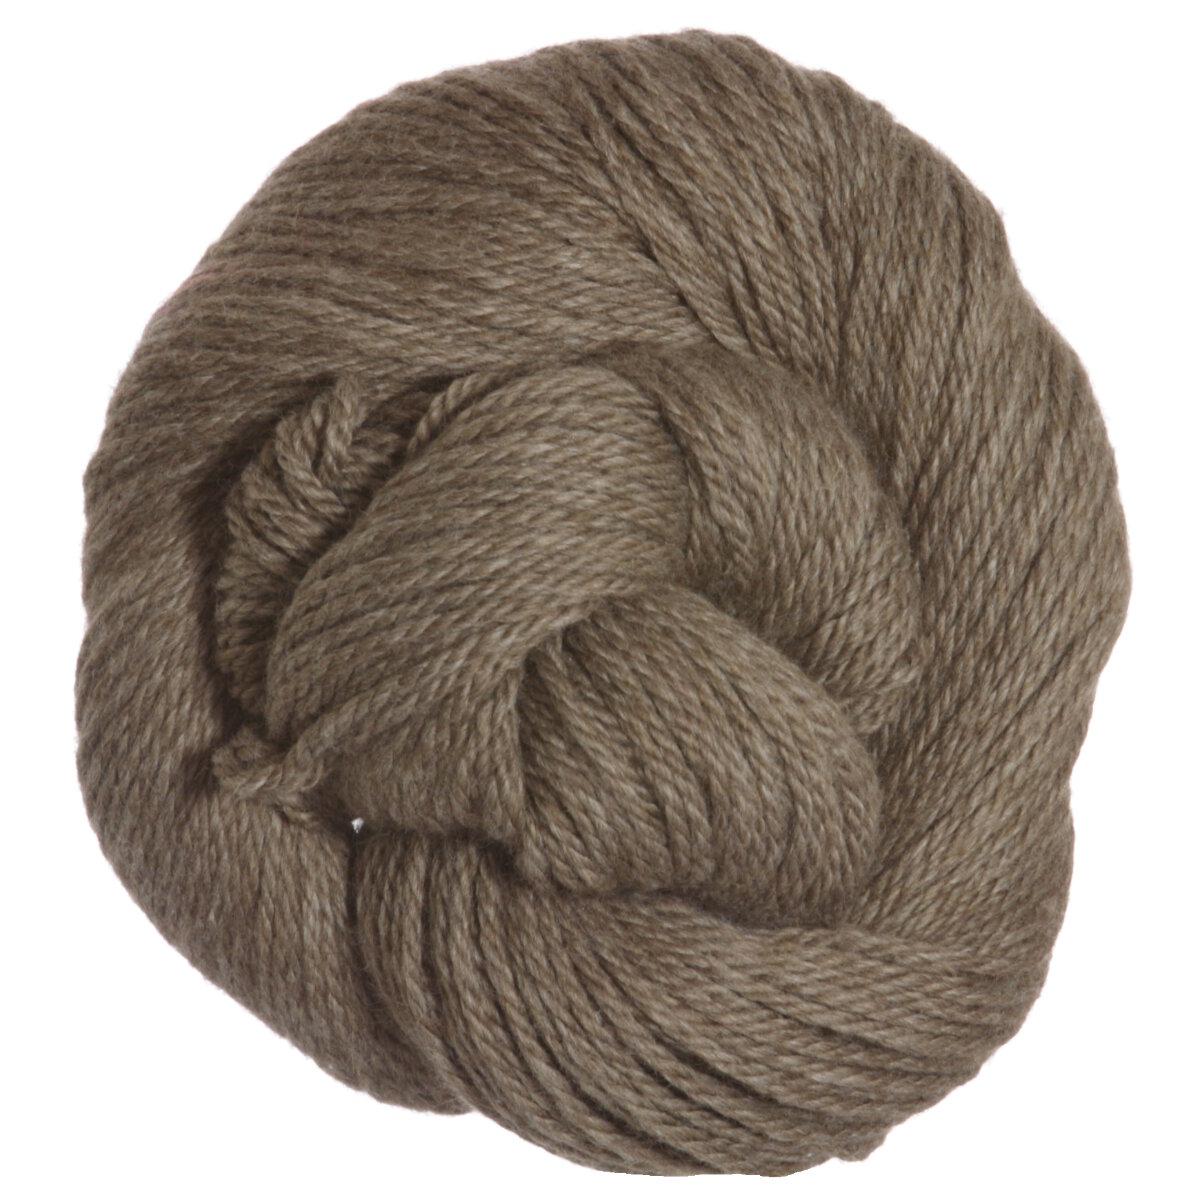 Spud Chloe Sweater Yarn 7524 Chocolate Milk At Jimmy Beans Wool